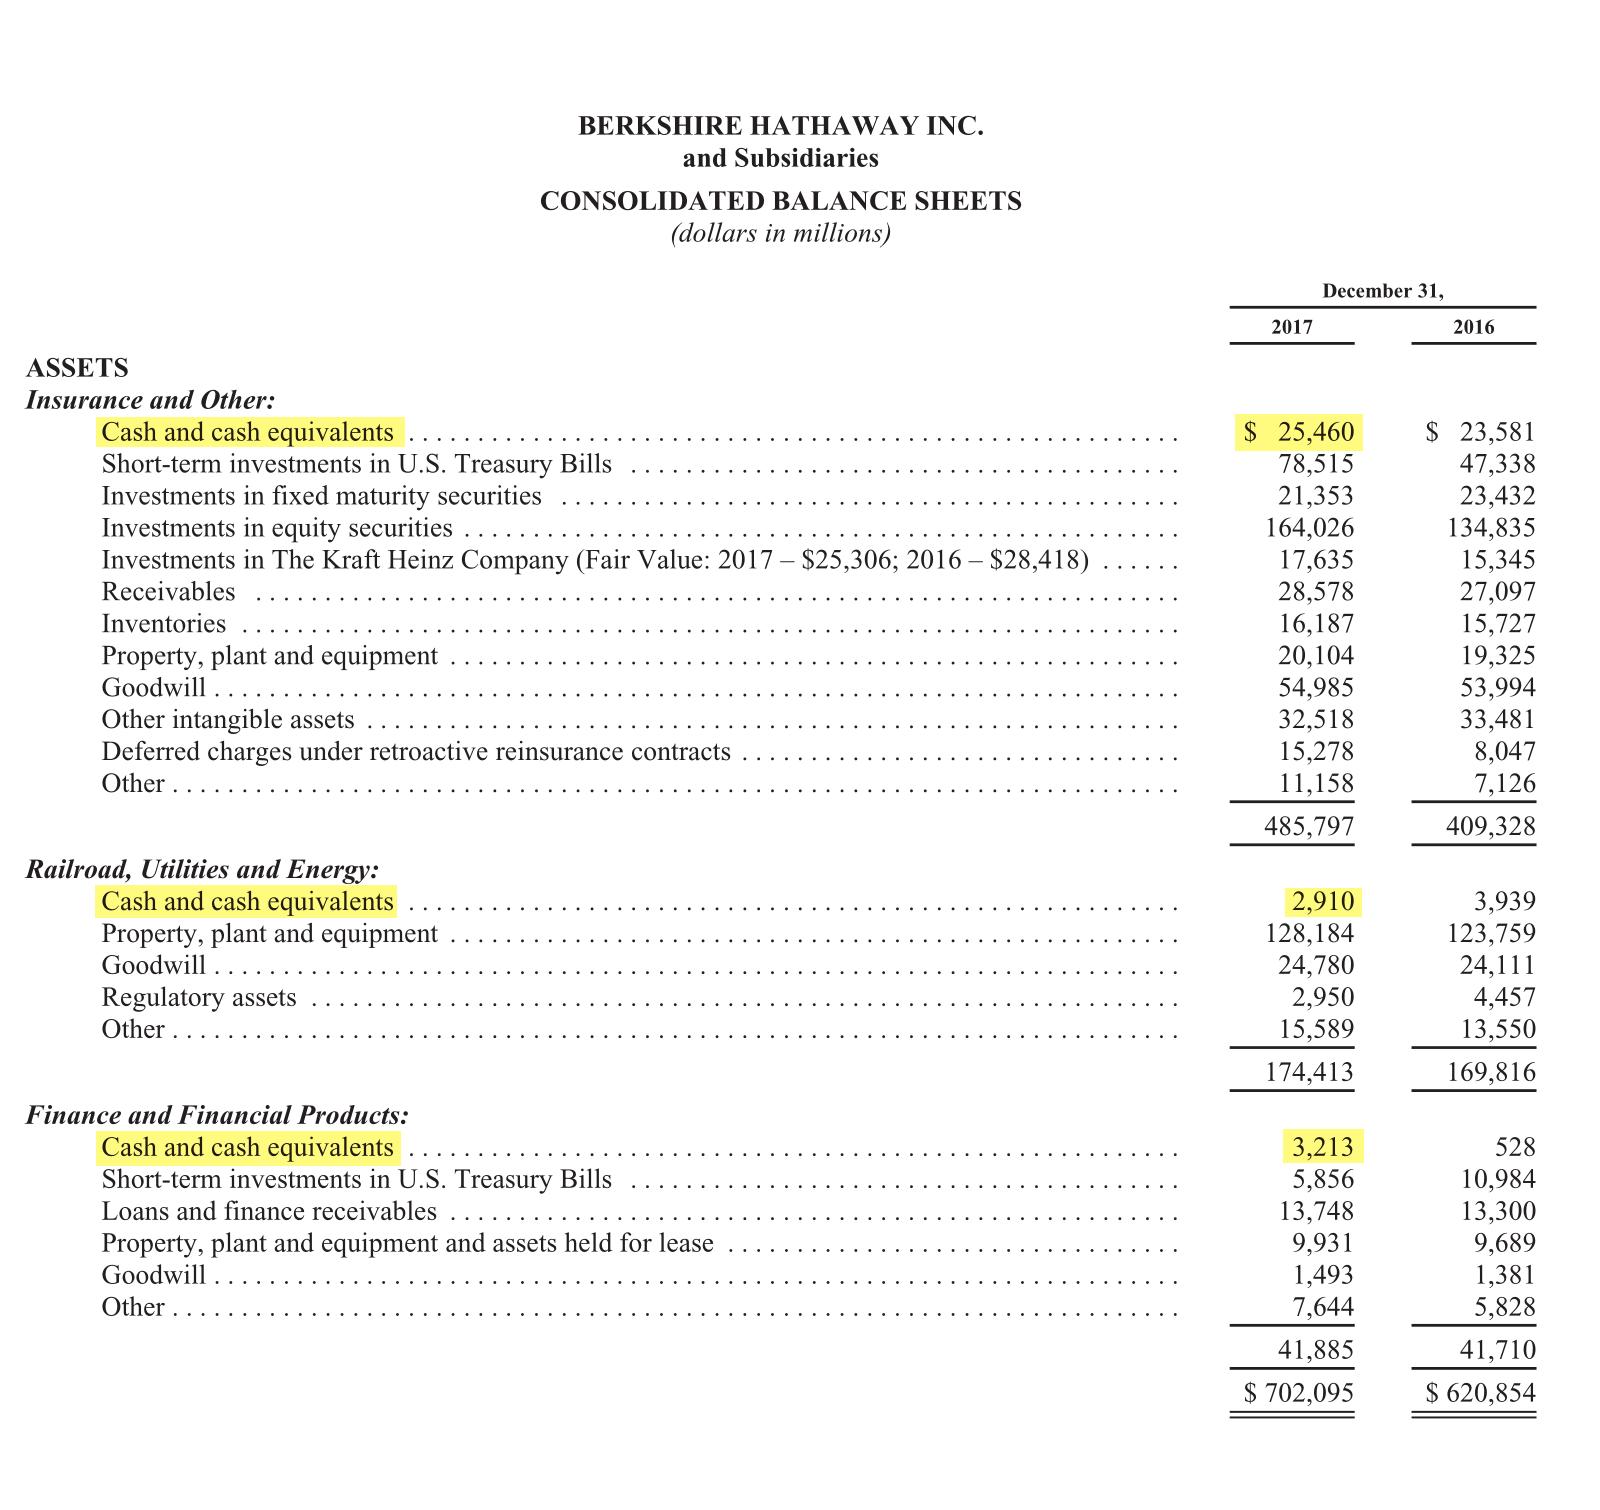 Страница 94 годового отчета Berkshire Hathaway за 2017 год